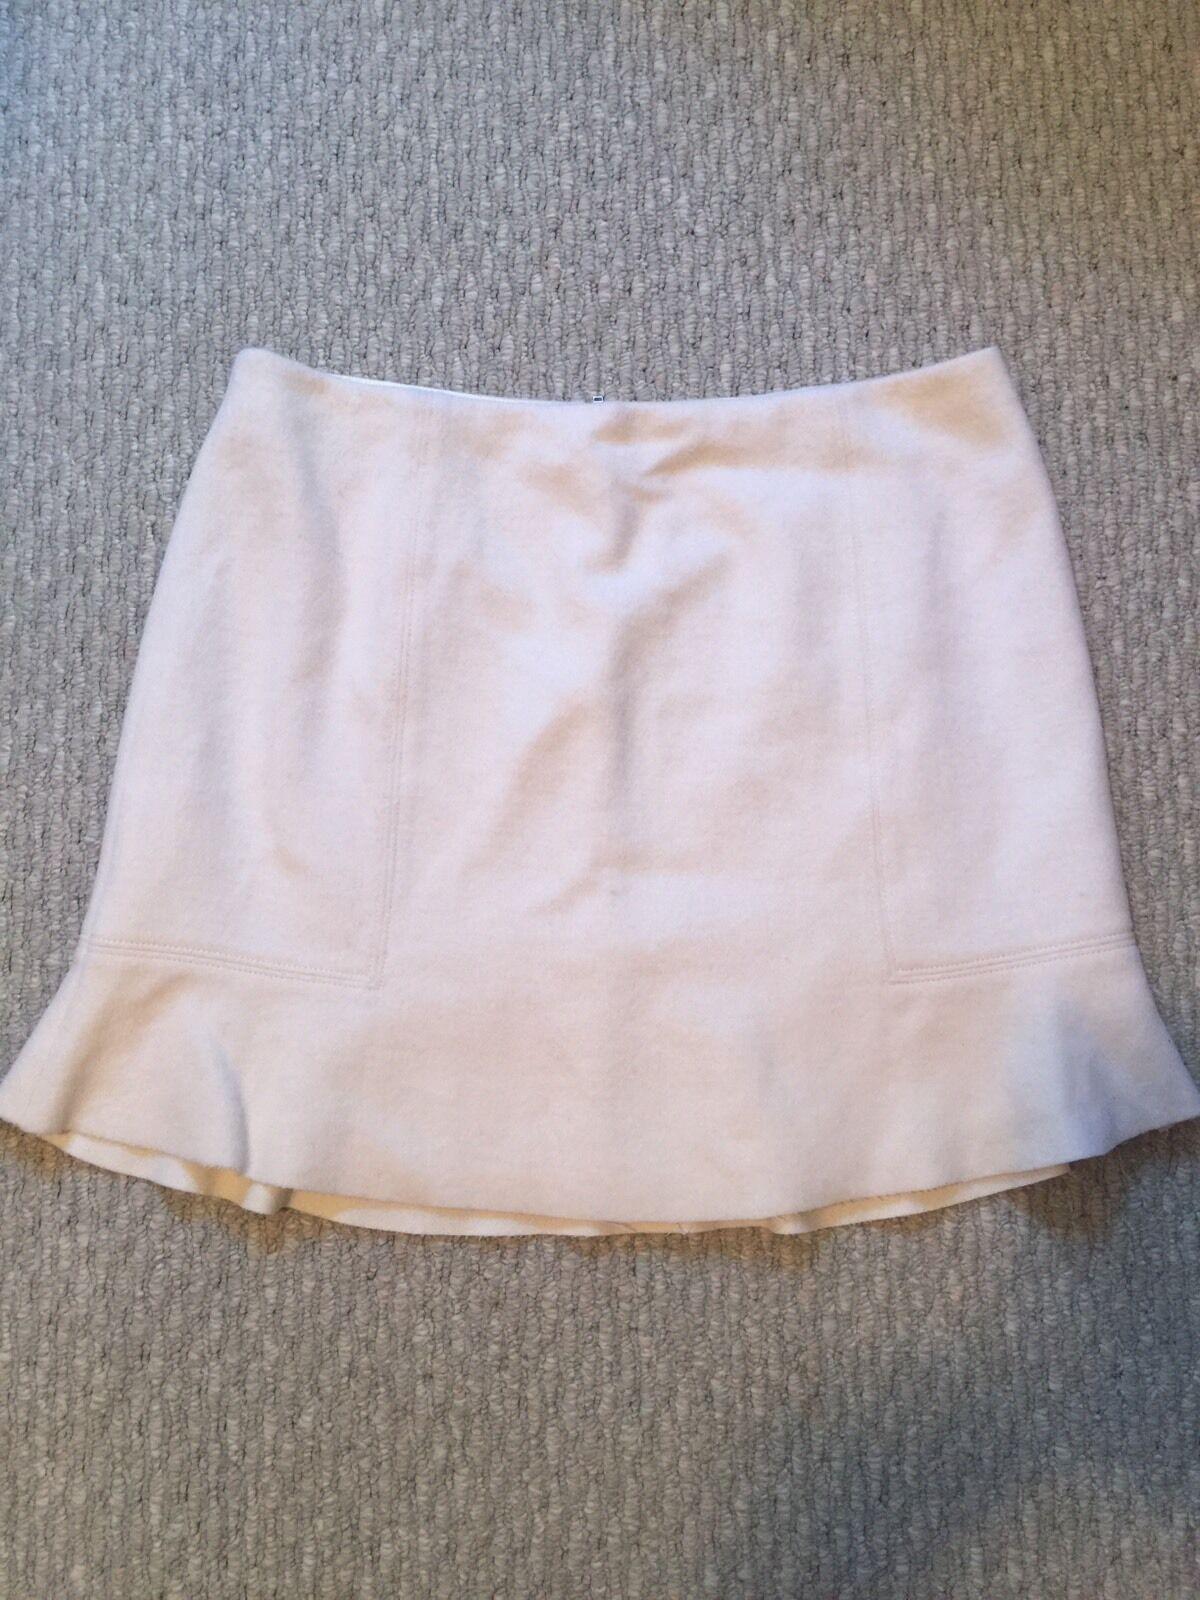 NWT NEW  J.Crew Madewell Boulevard Wool Flare Skirt In Ivory B2995 Size 12  88